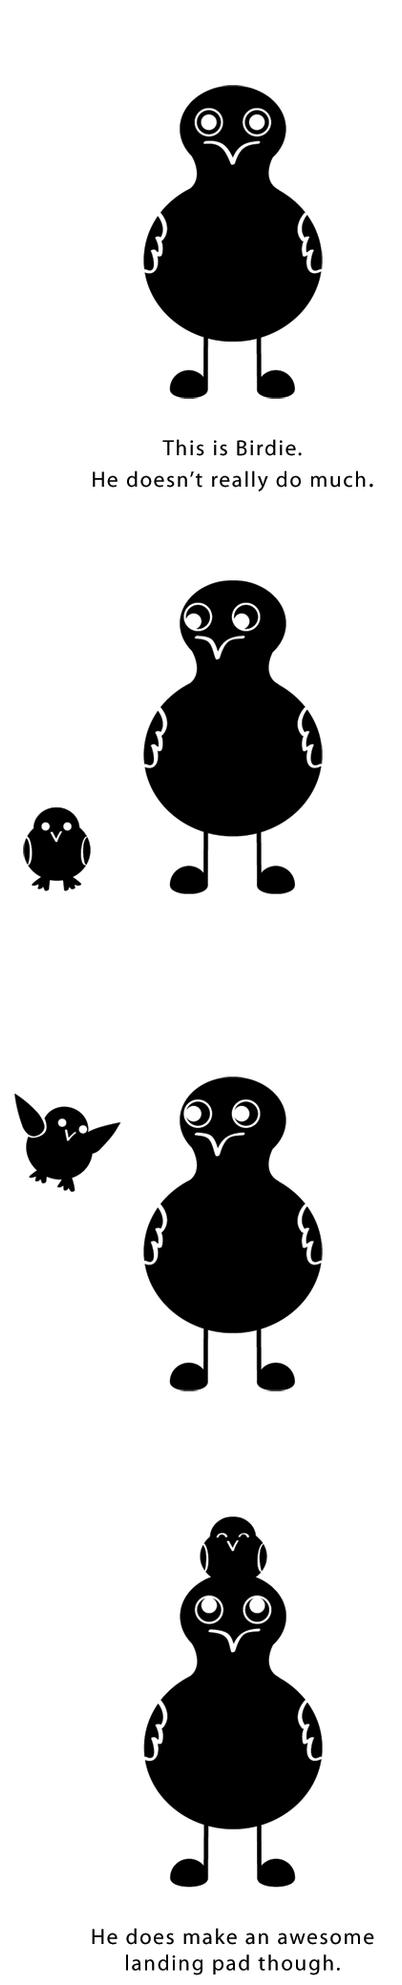 About Birdie by edynae